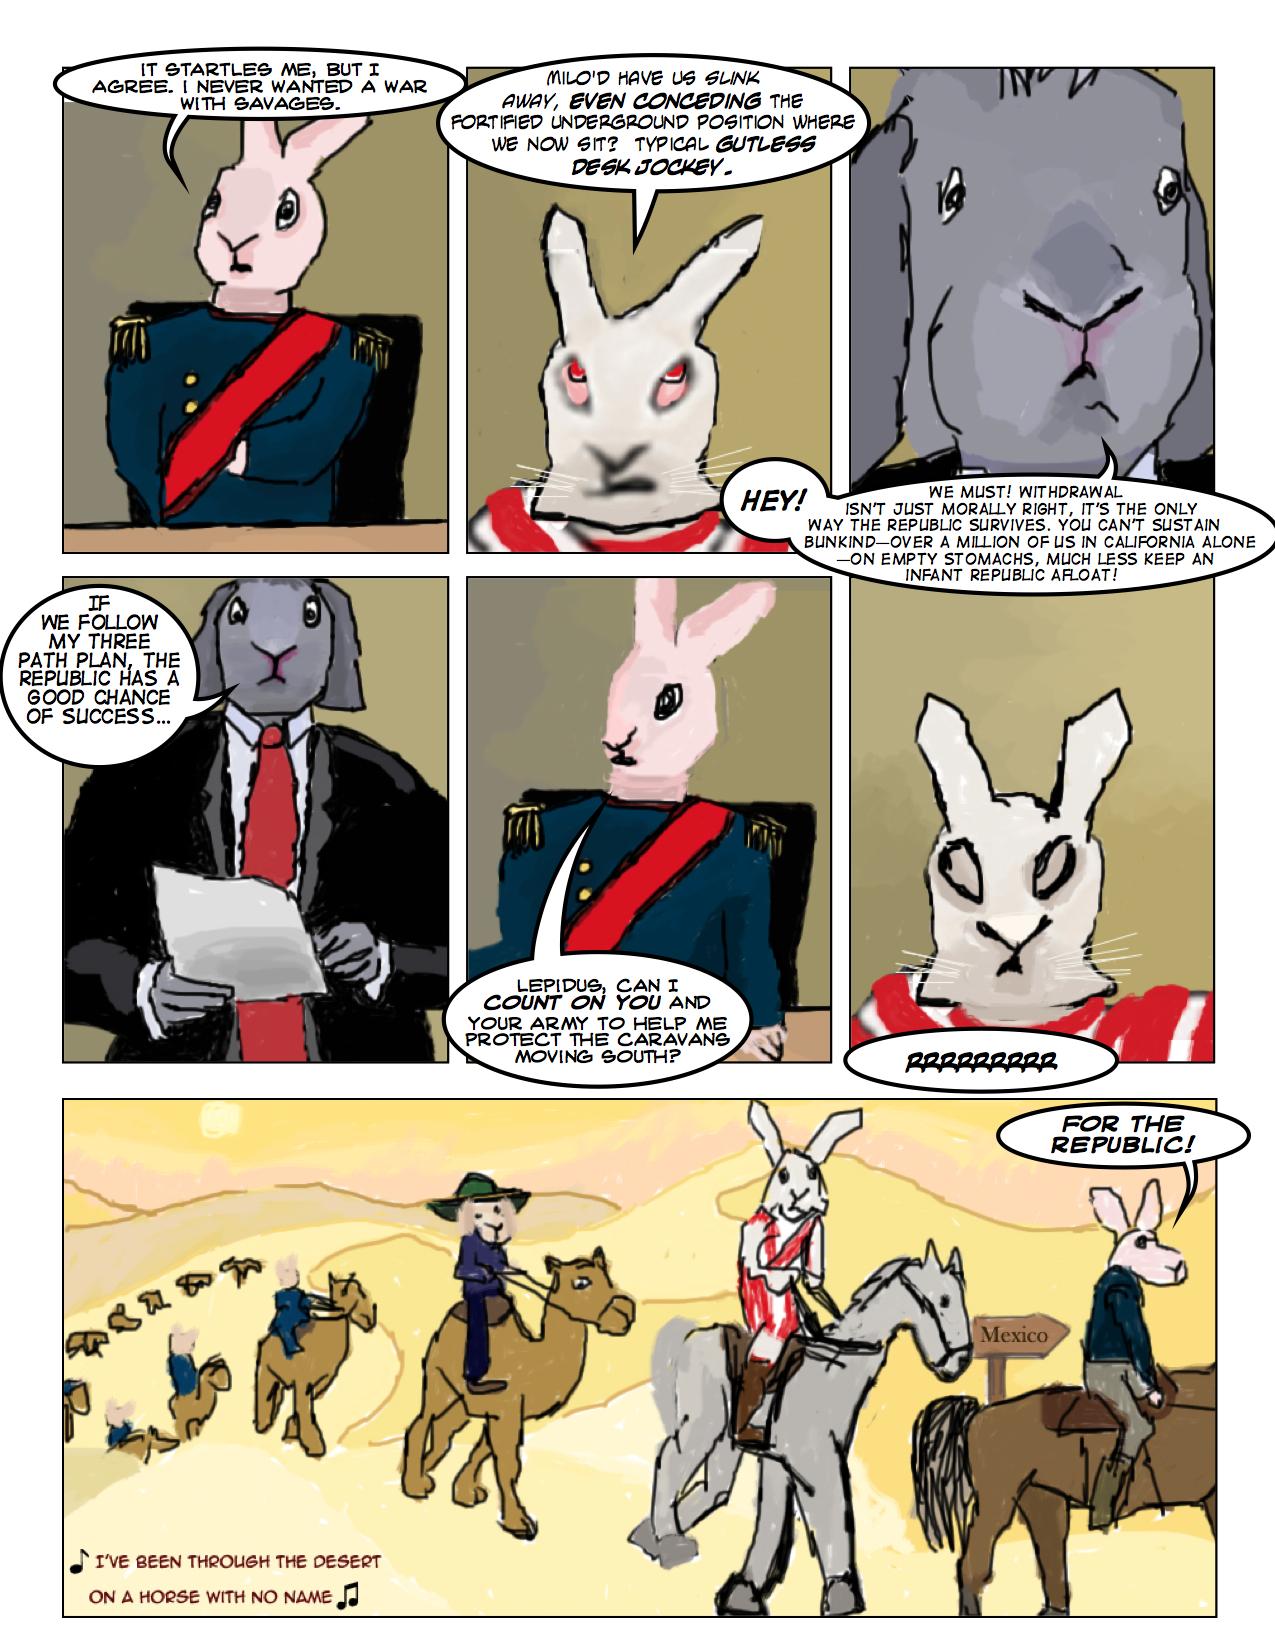 comic-2012-08-07-Bunnies-in-Space-The-Beginning-Through-the-Desert.jpg